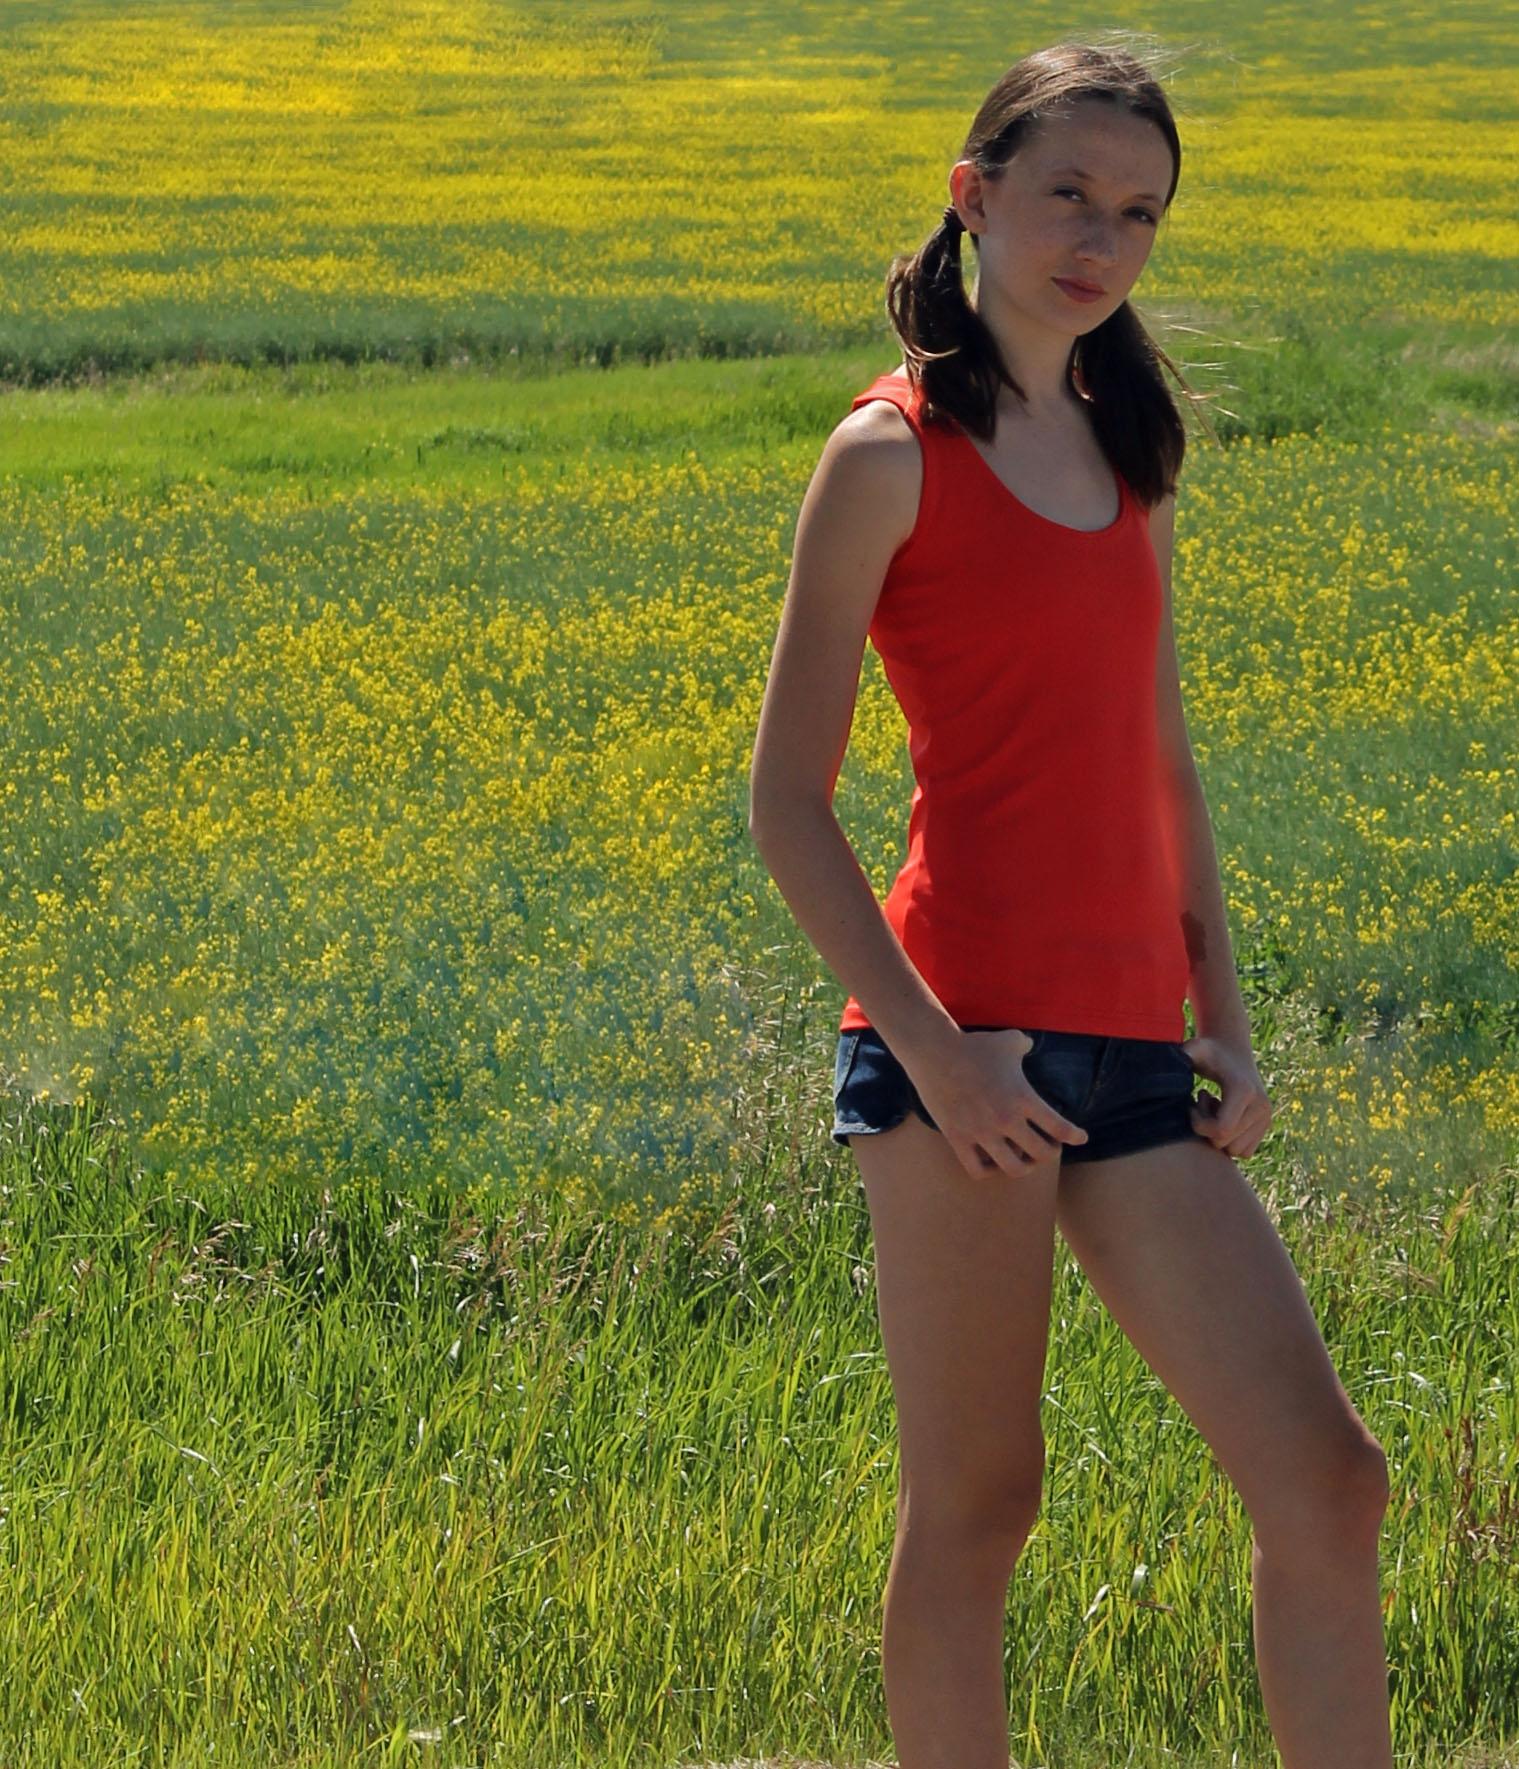 TerraFrog Athletic Wear Launches New E-Commerce Yoga